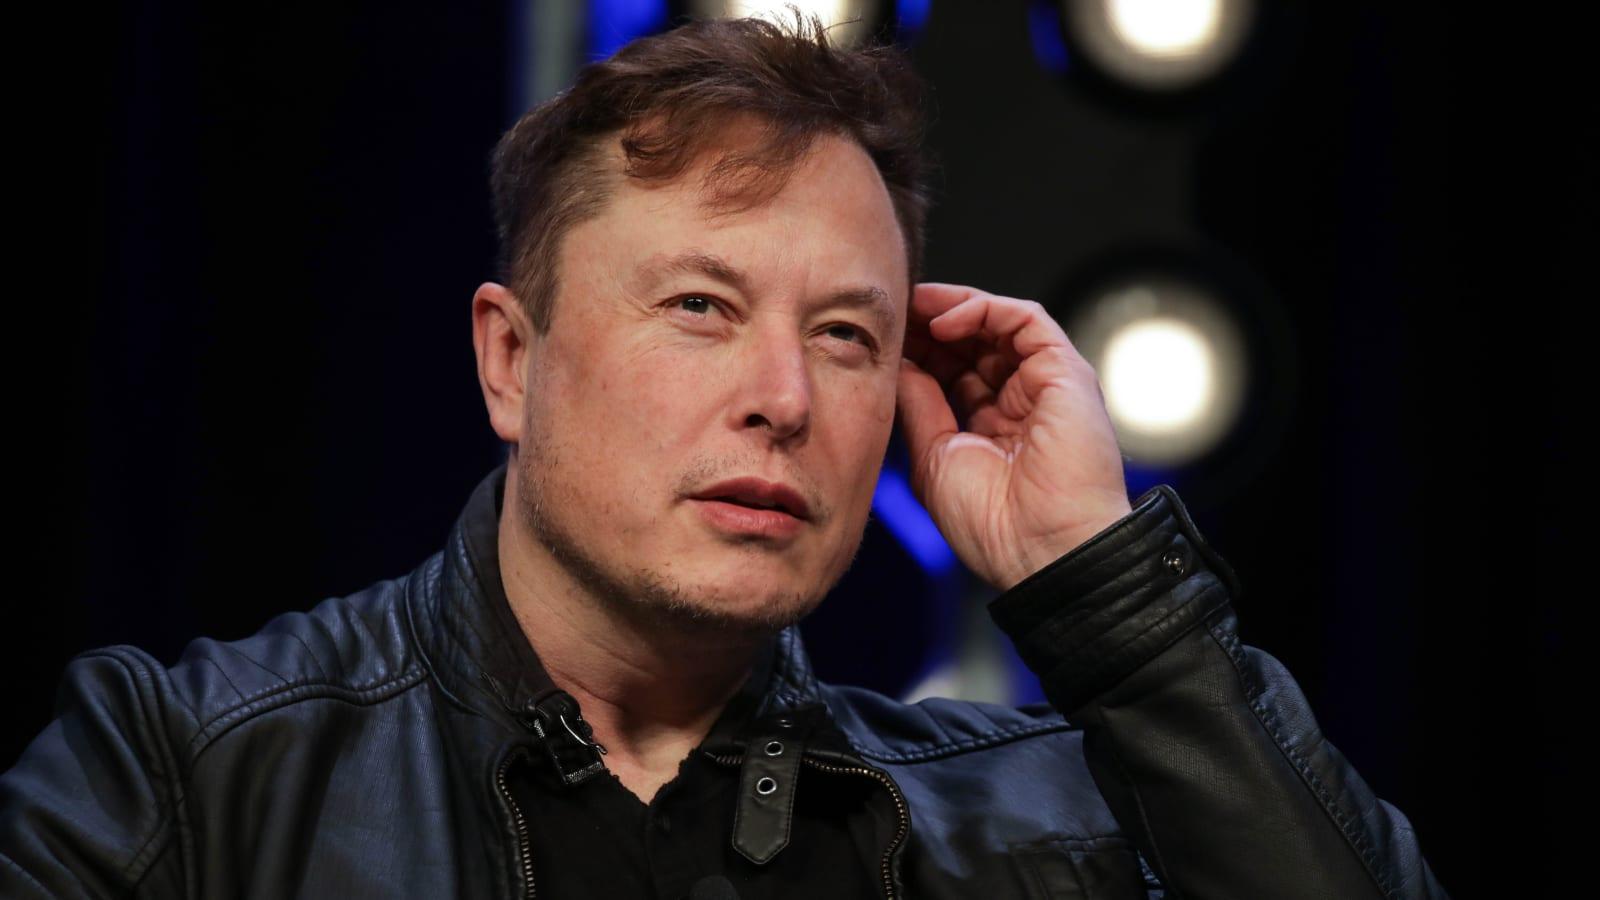 Elon Musk says bitcoin seems high after surpassing $20 trillion ...